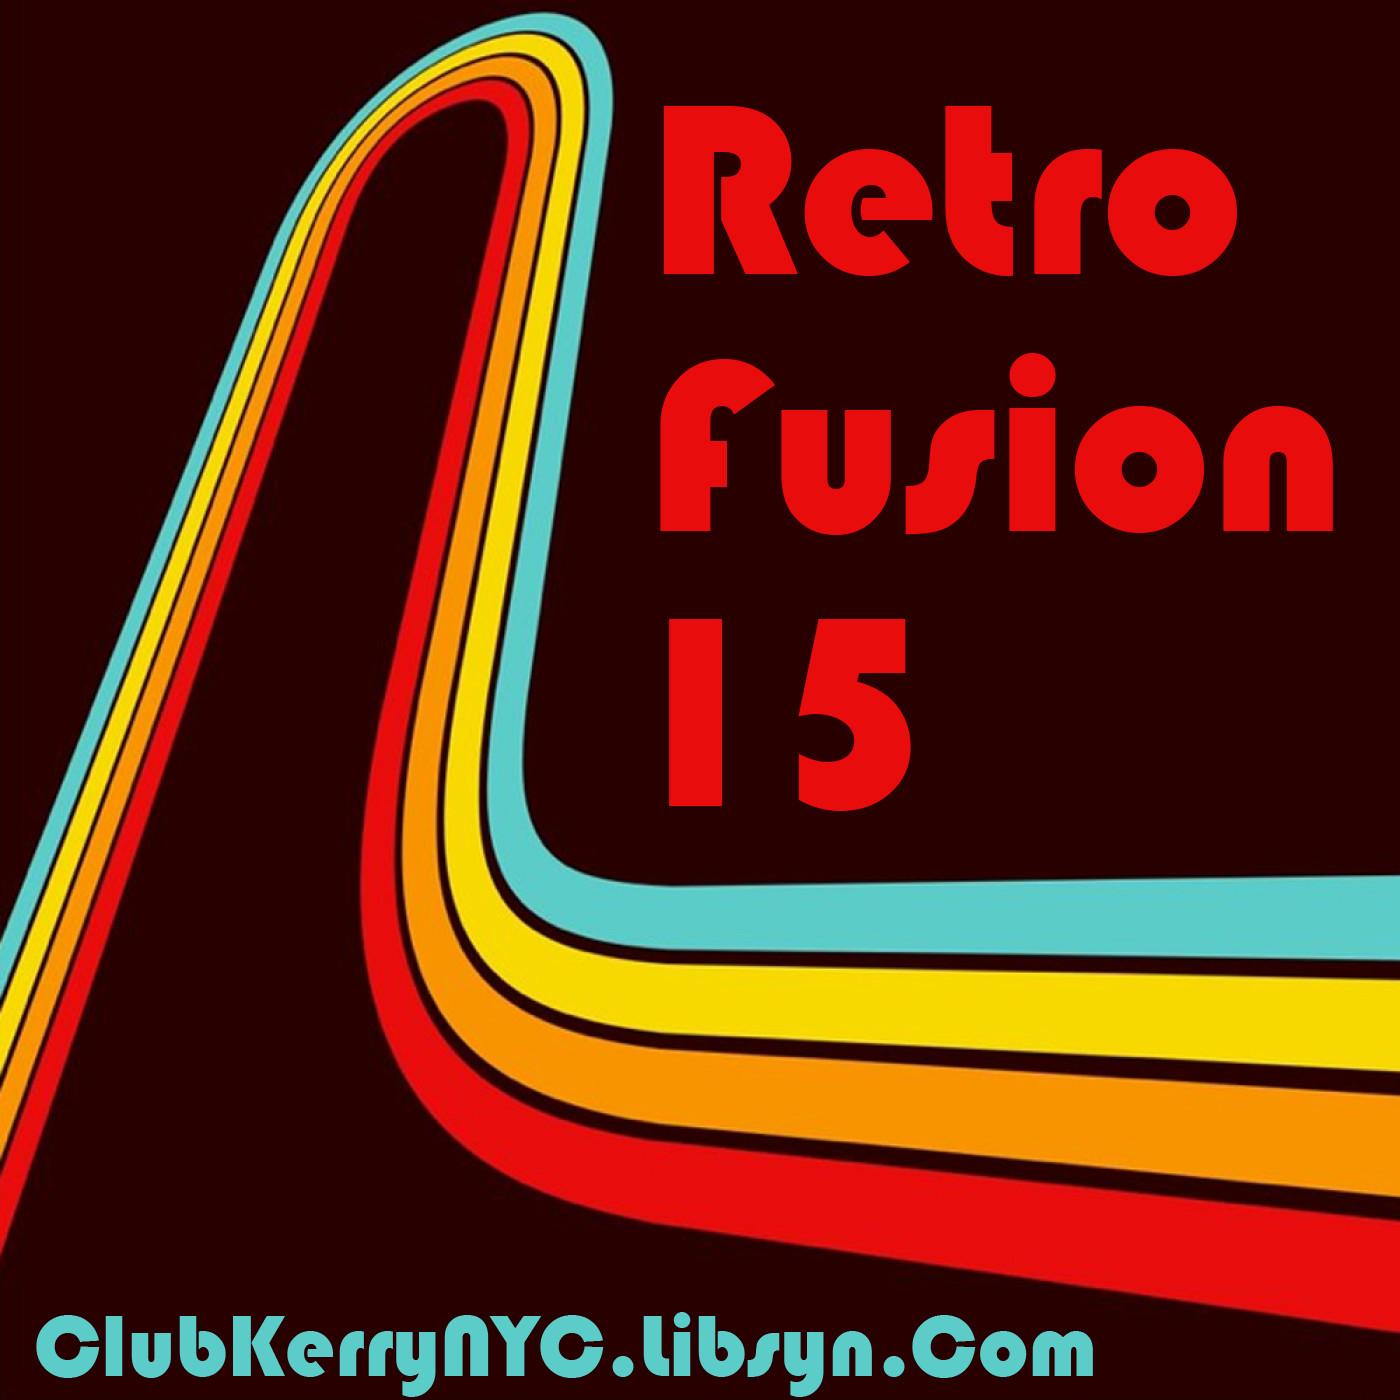 Retro Fusion 15 (Vocal House, Dance, Deep House, Melodic House) - DJ Kerry John Poynter show art